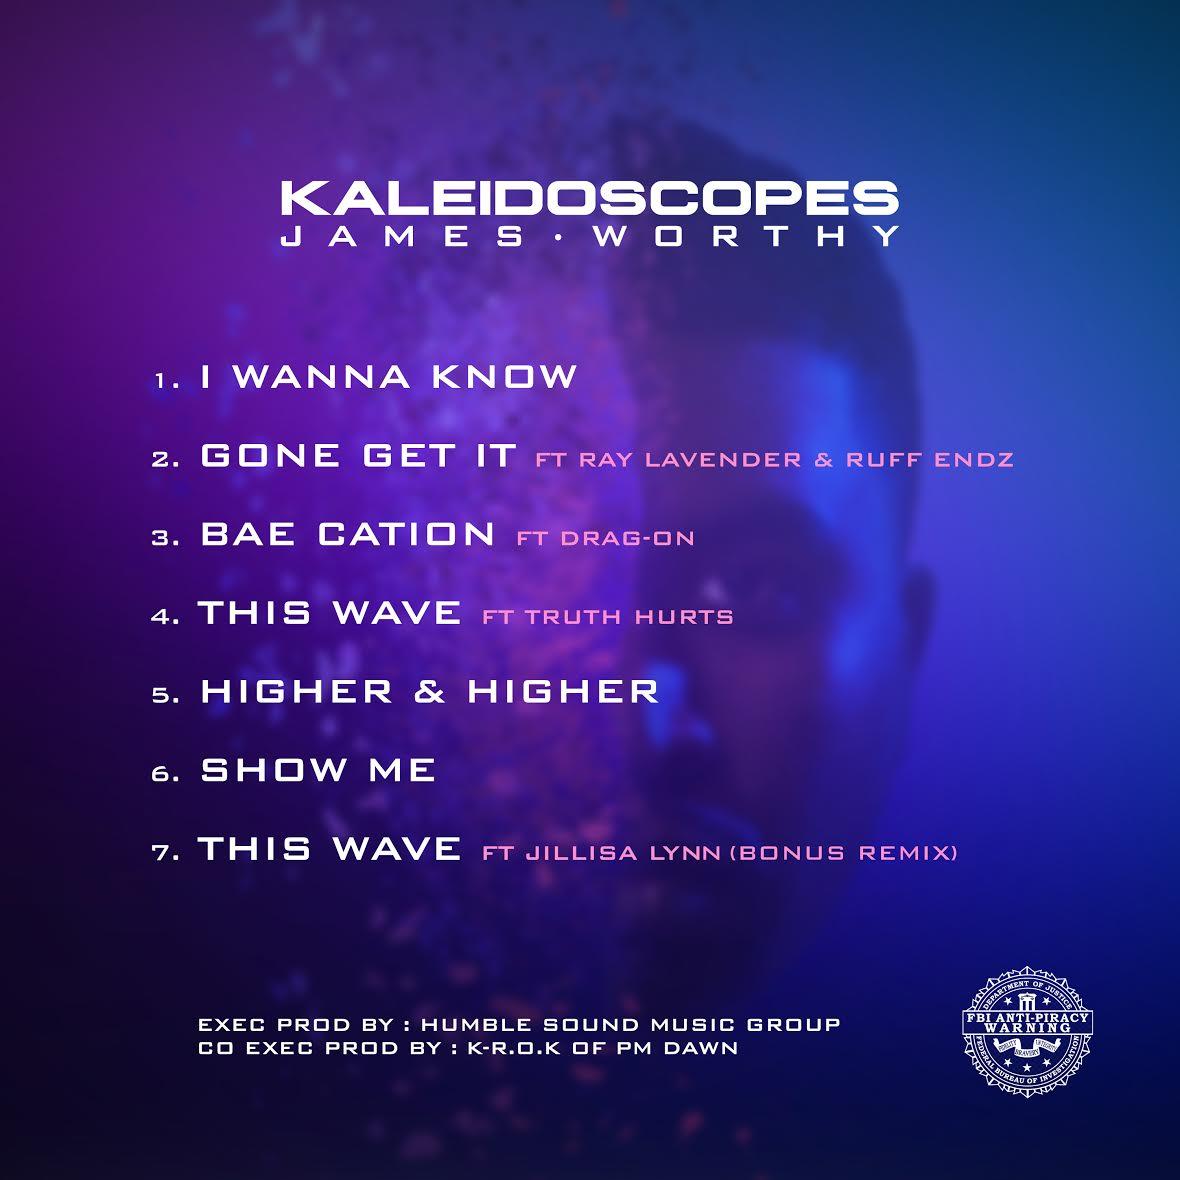 James Worthy - Kaleidoscopes EP (Back Cover)